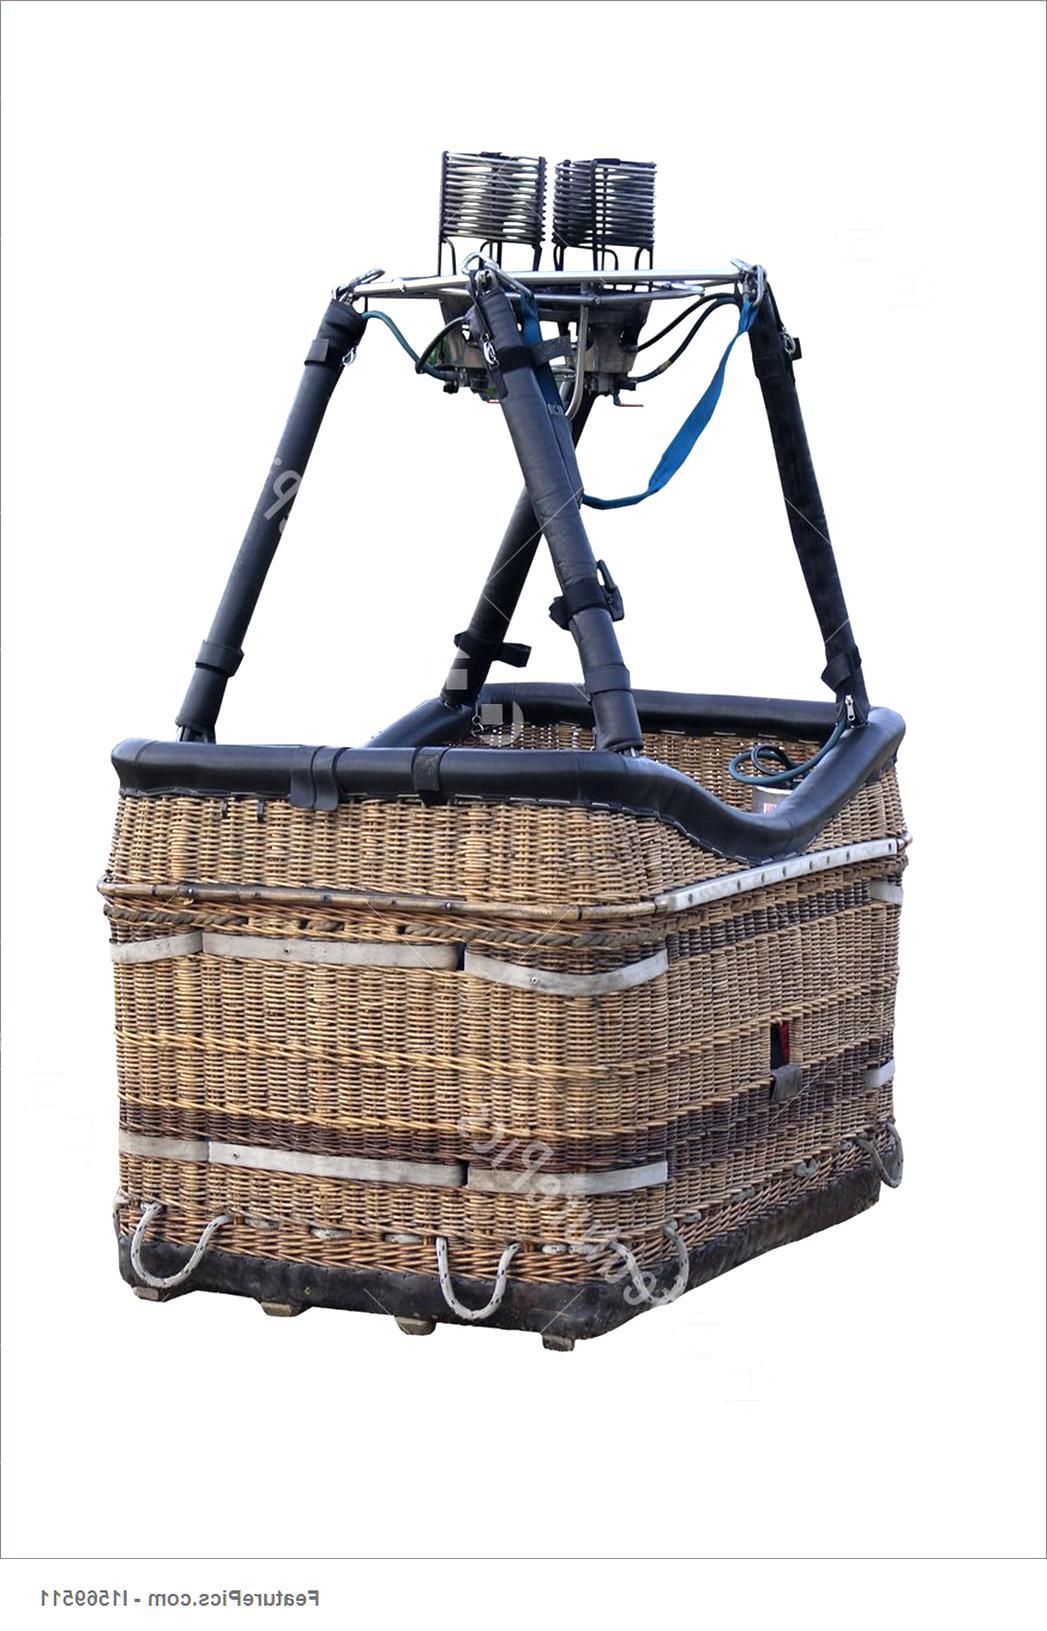 hot air balloon basket for sale